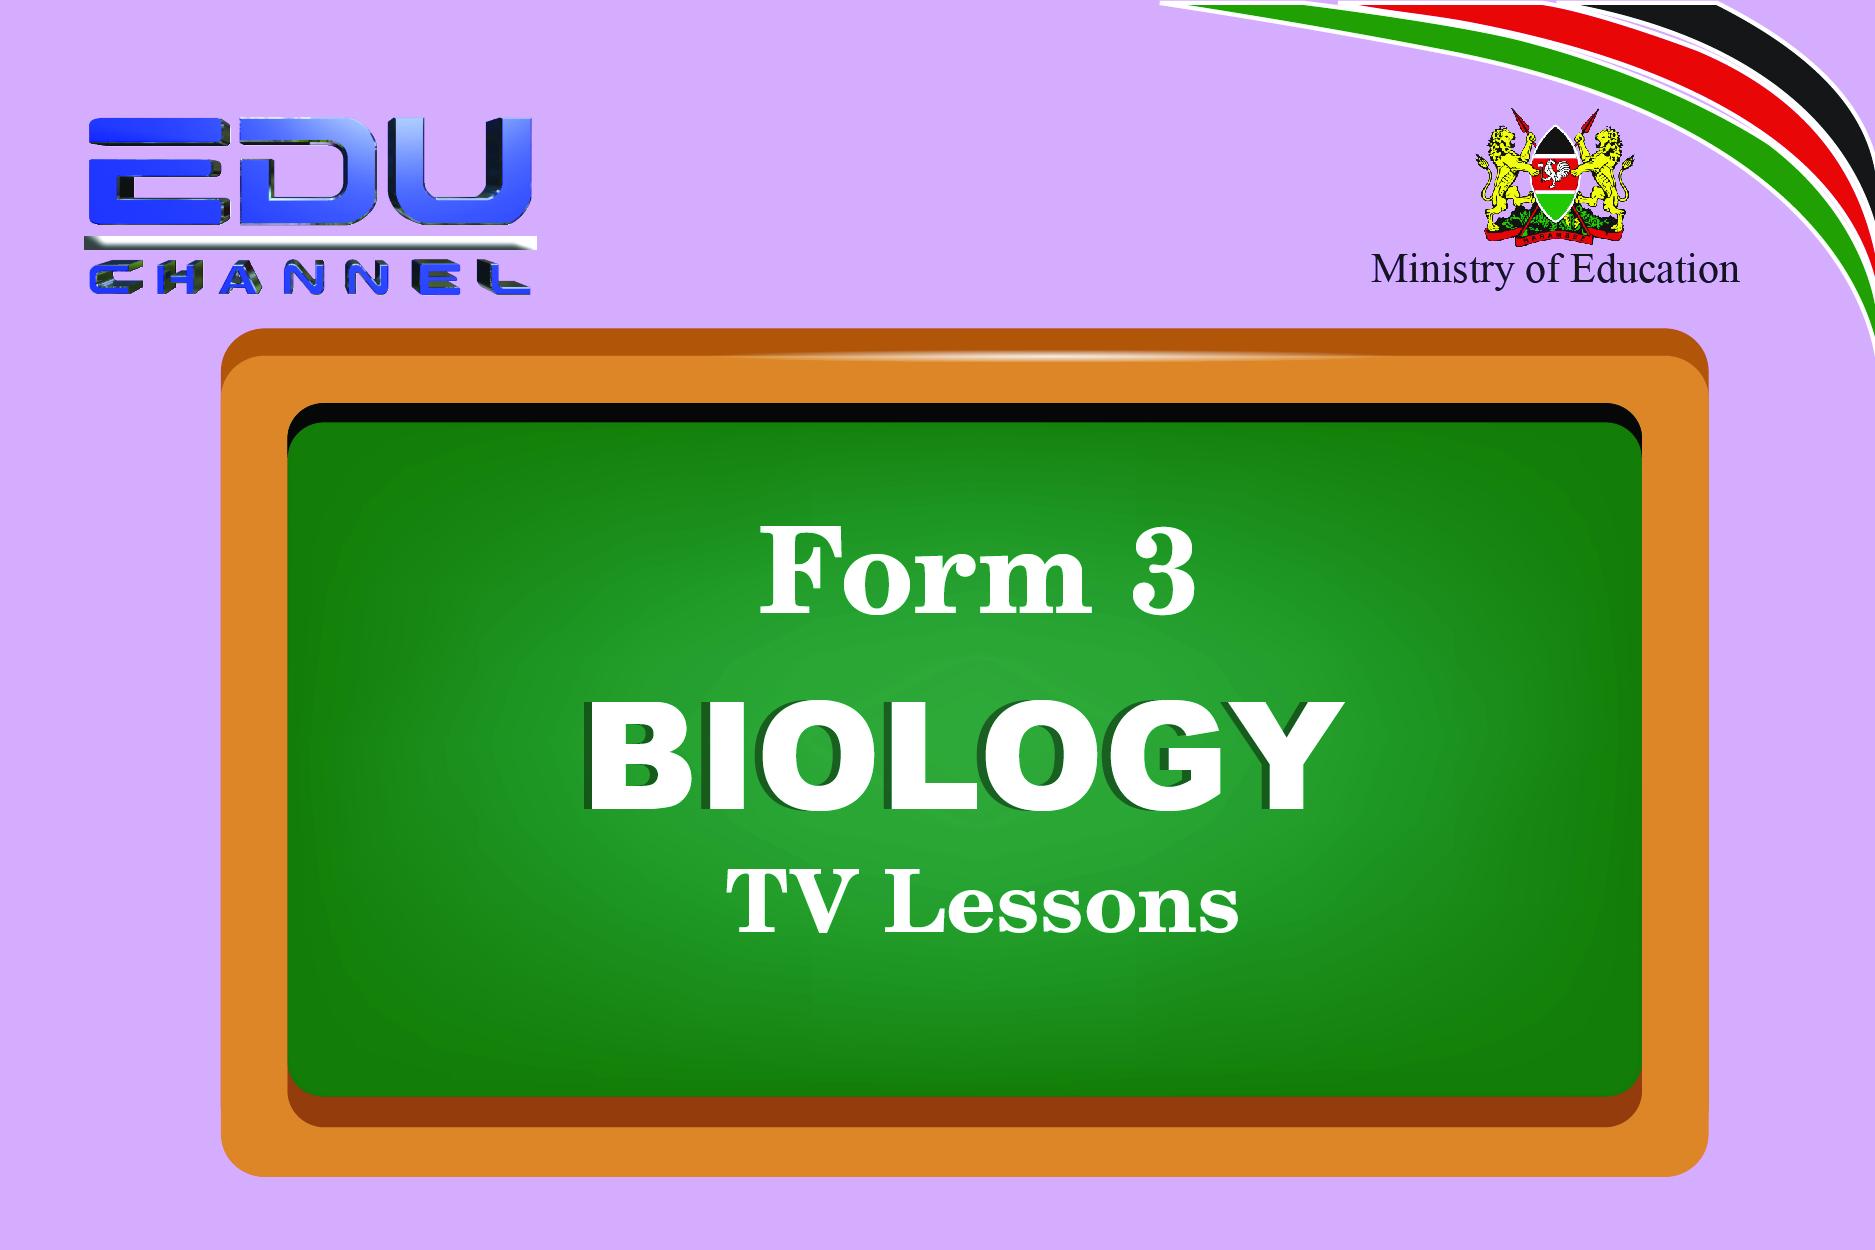 Form 3 Biology Lesson 1: Classification II